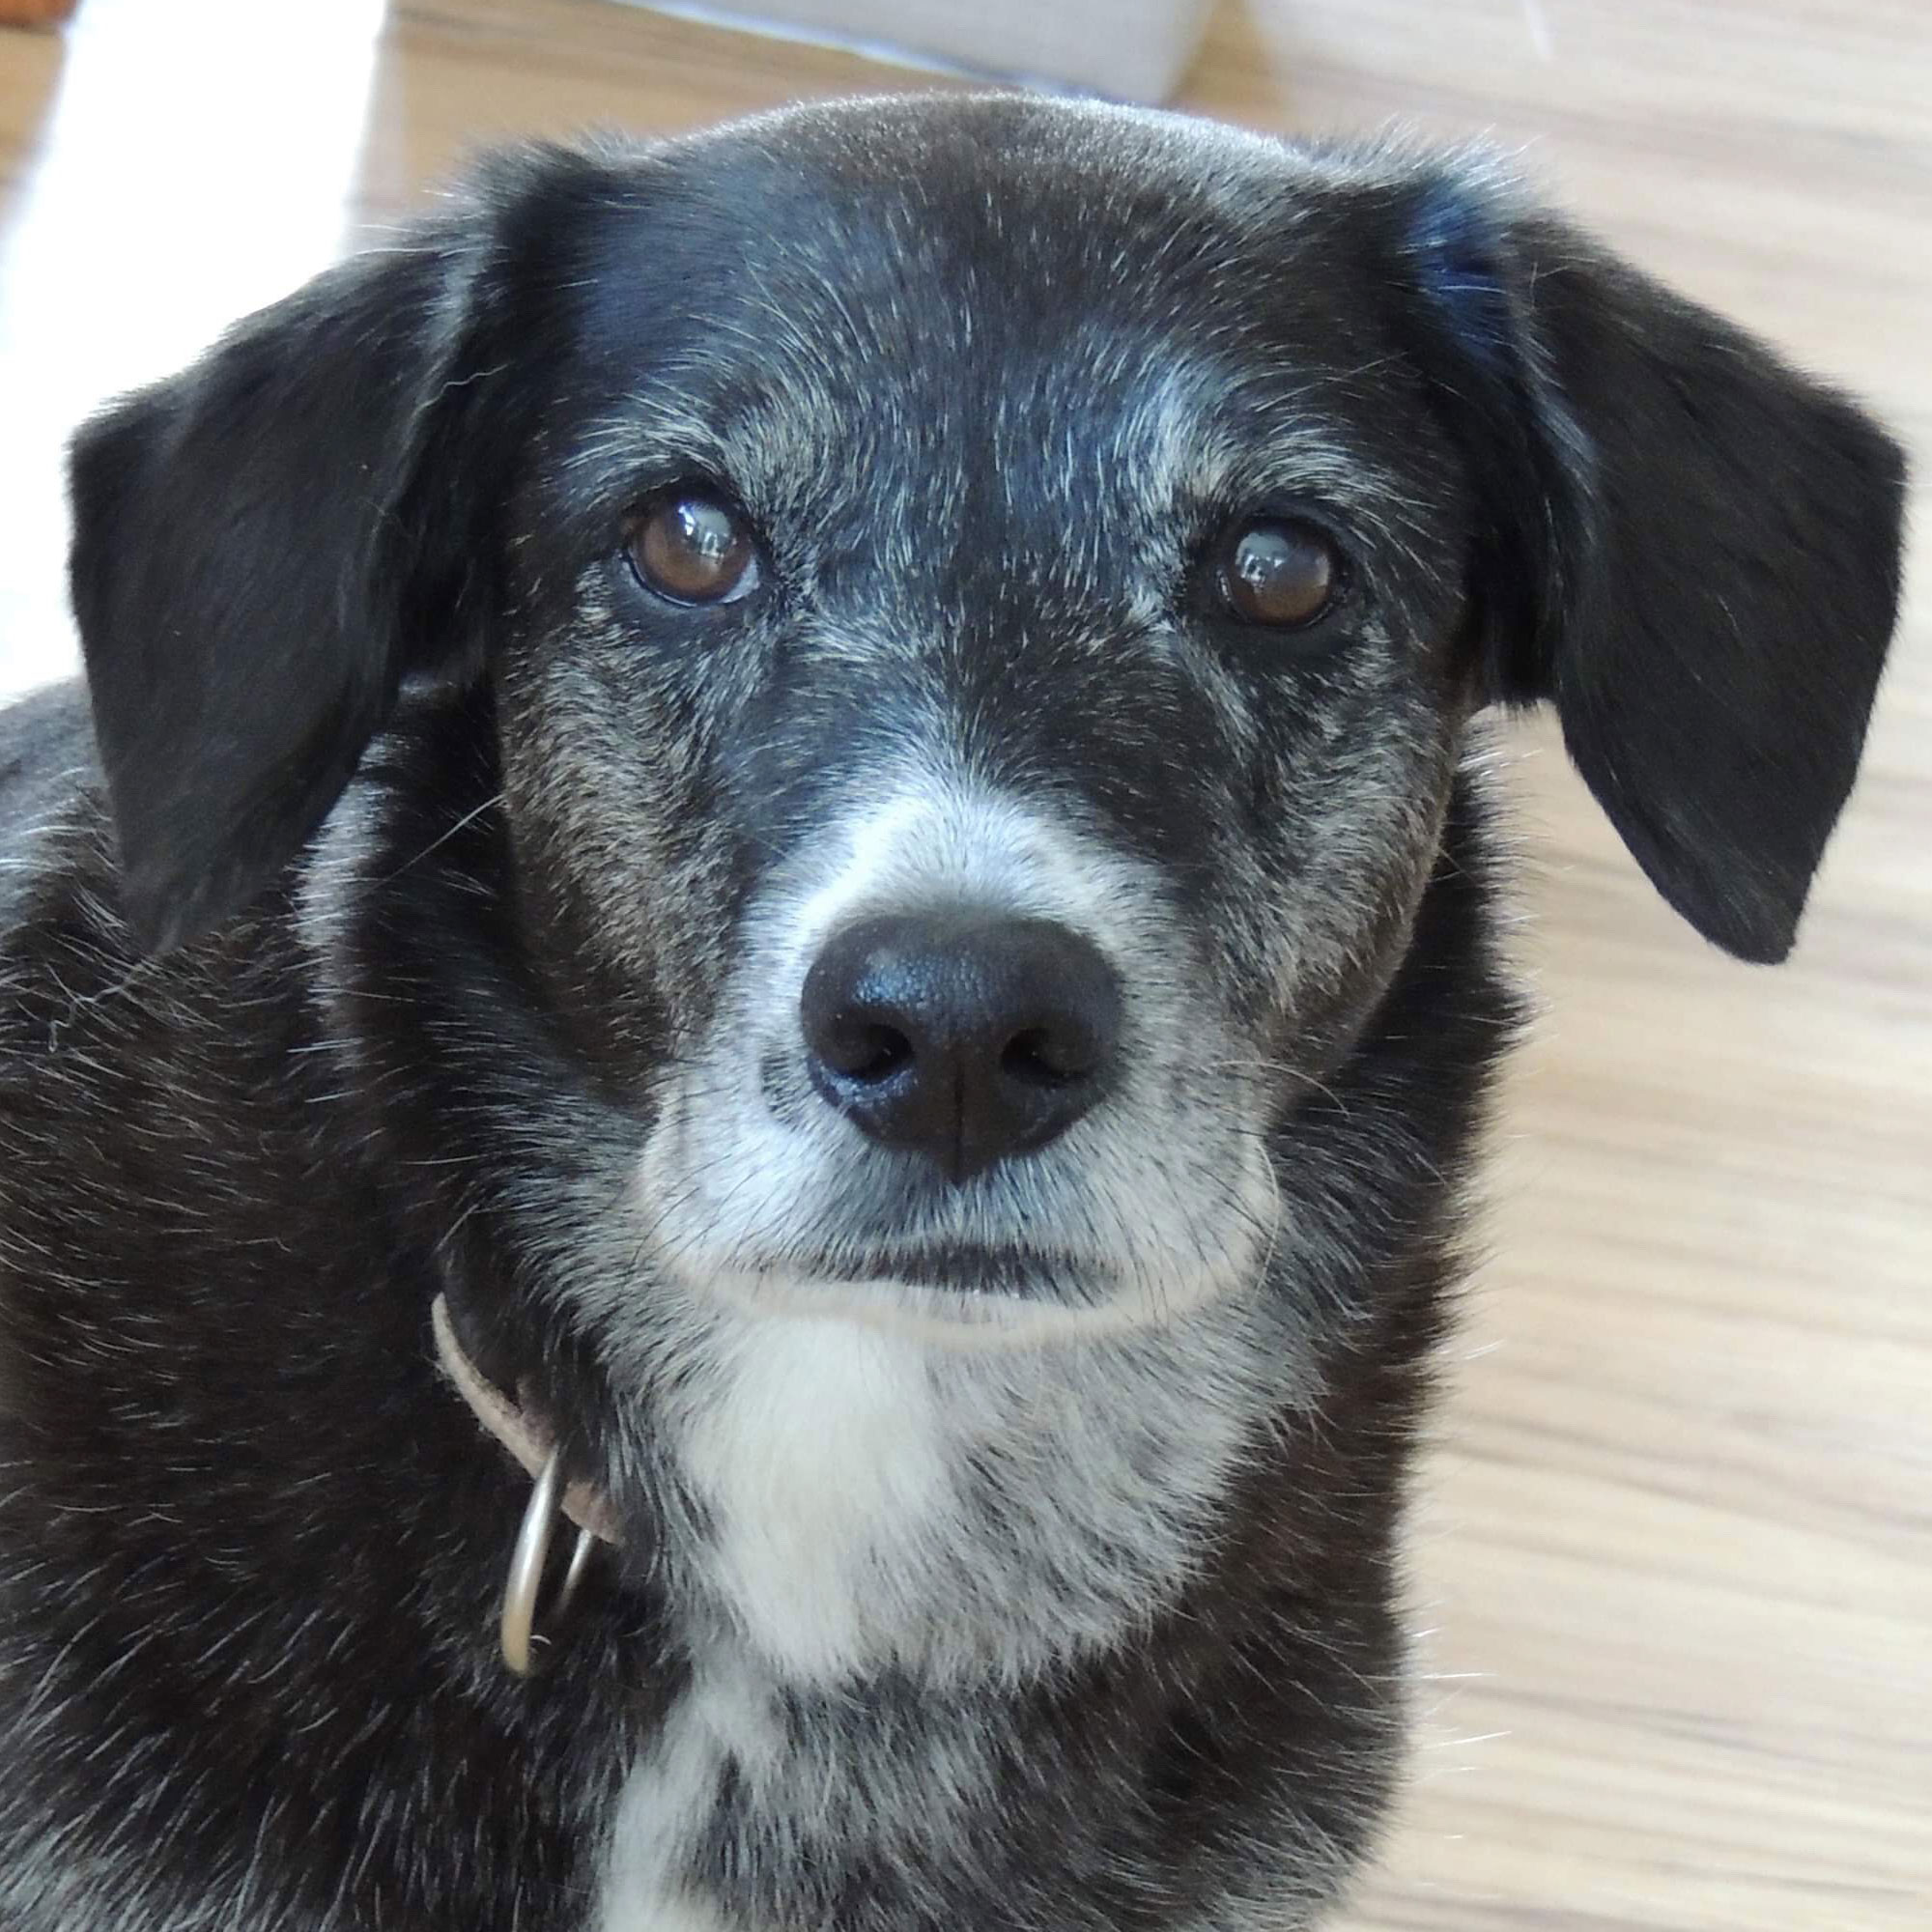 photo-chien-lady-zootherapie-daniele-monast